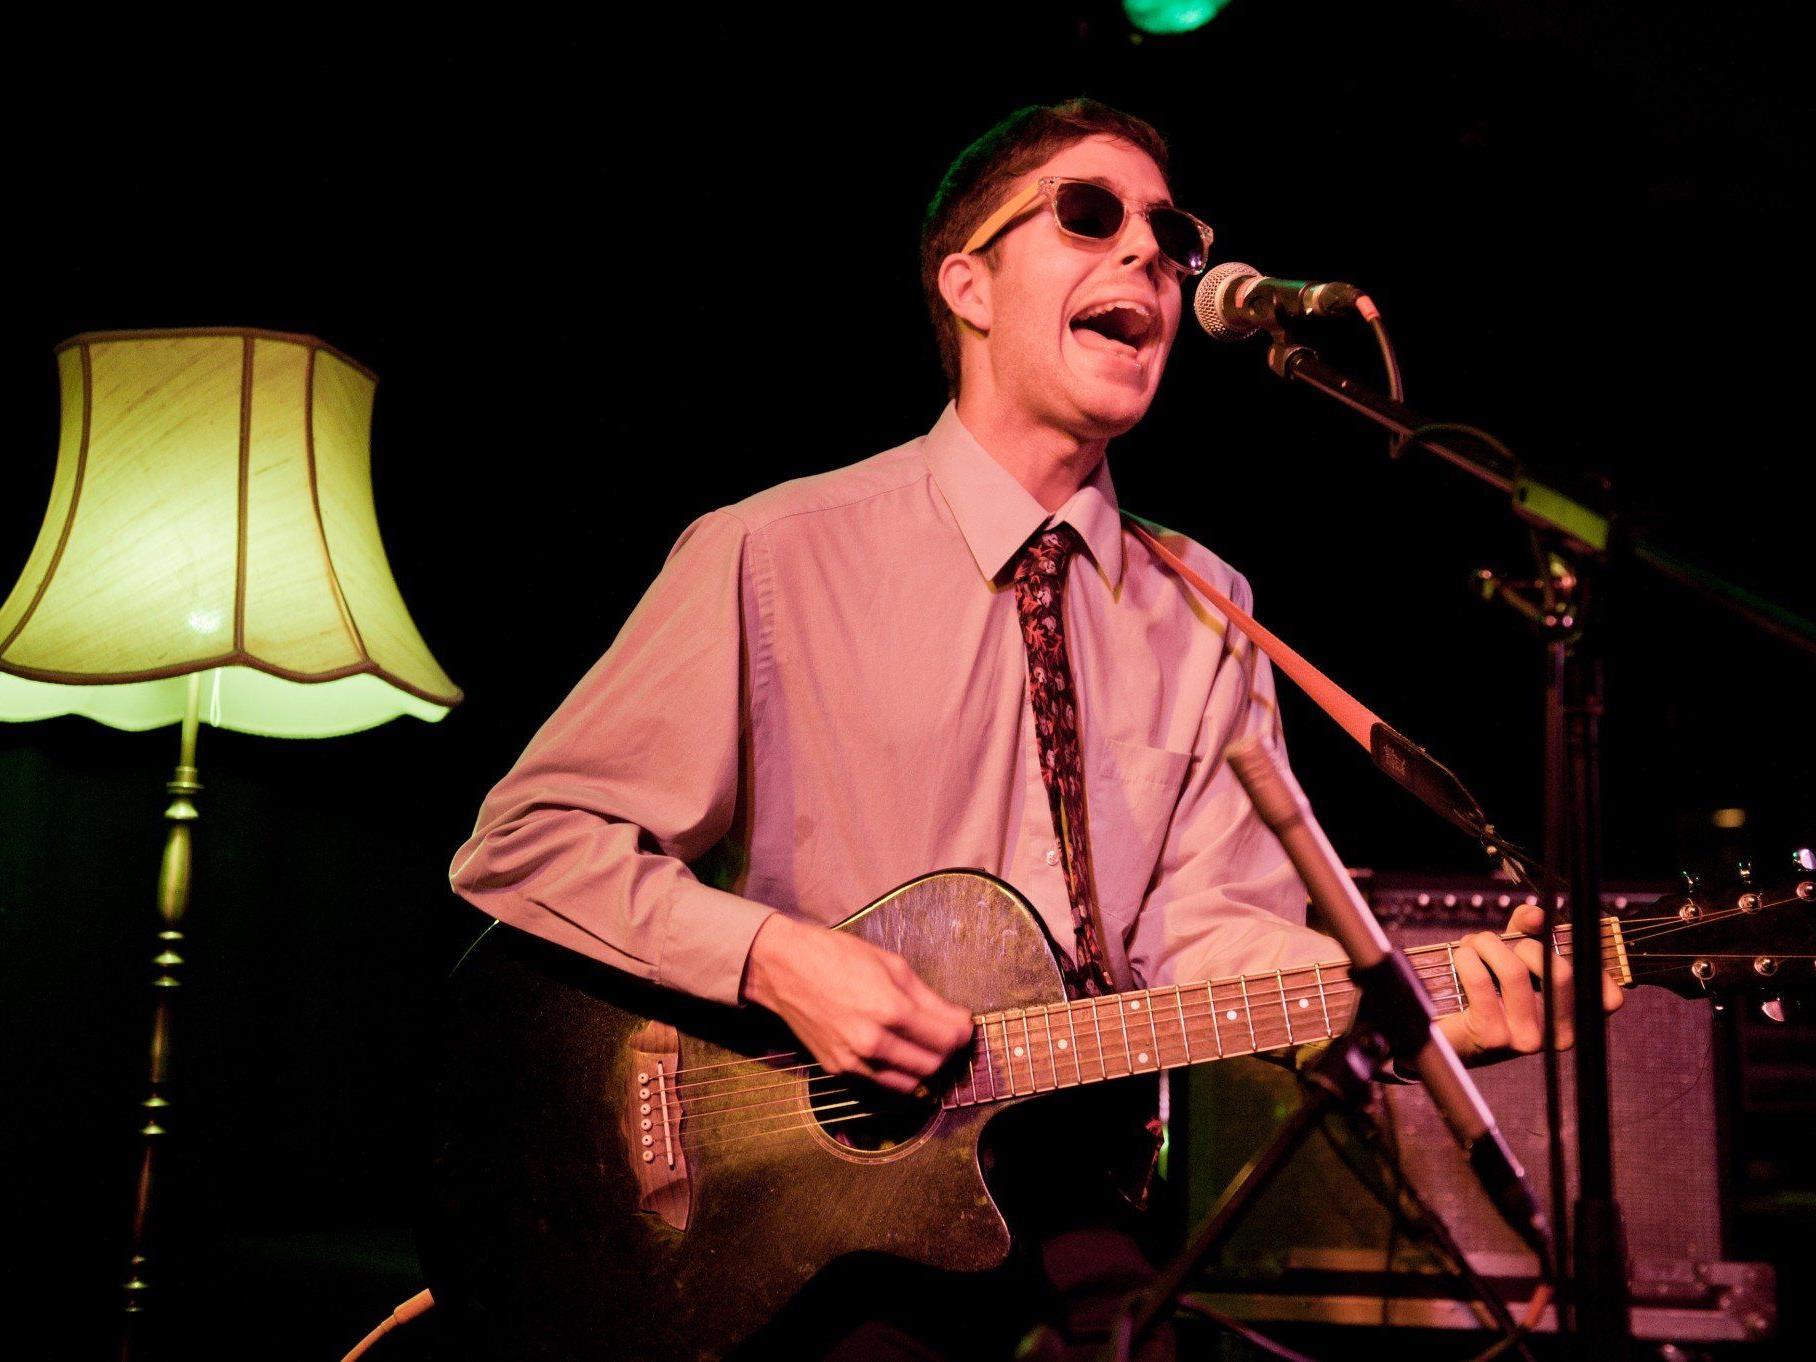 Ezra Furman präsentiert am 1. Februar sein neues Album im Carinisaal.